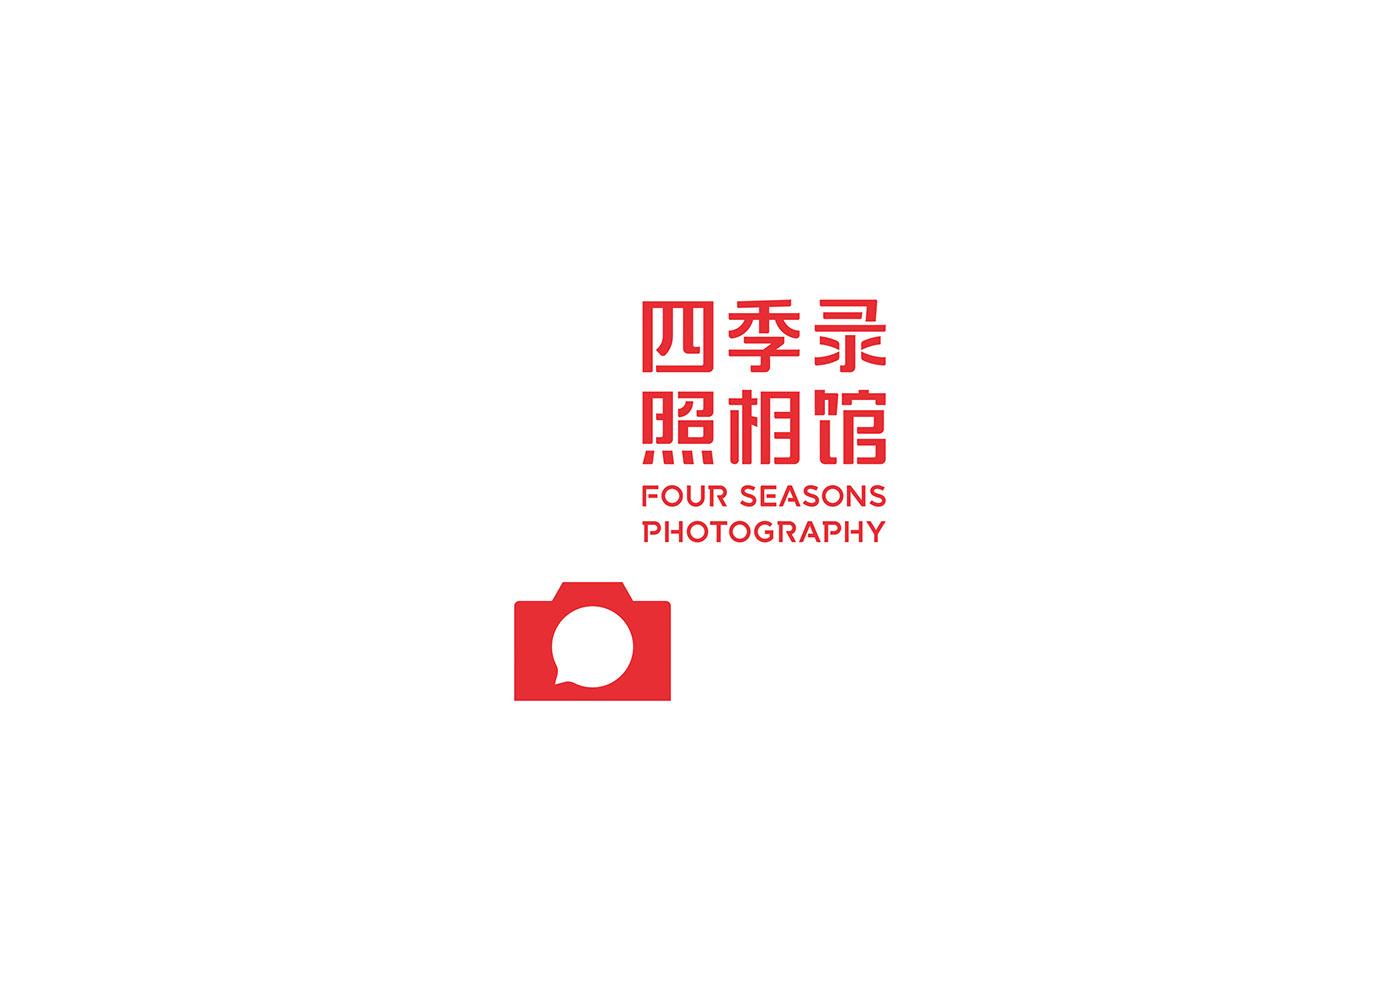 photograph line camera china red badge Certificates seasons speak record